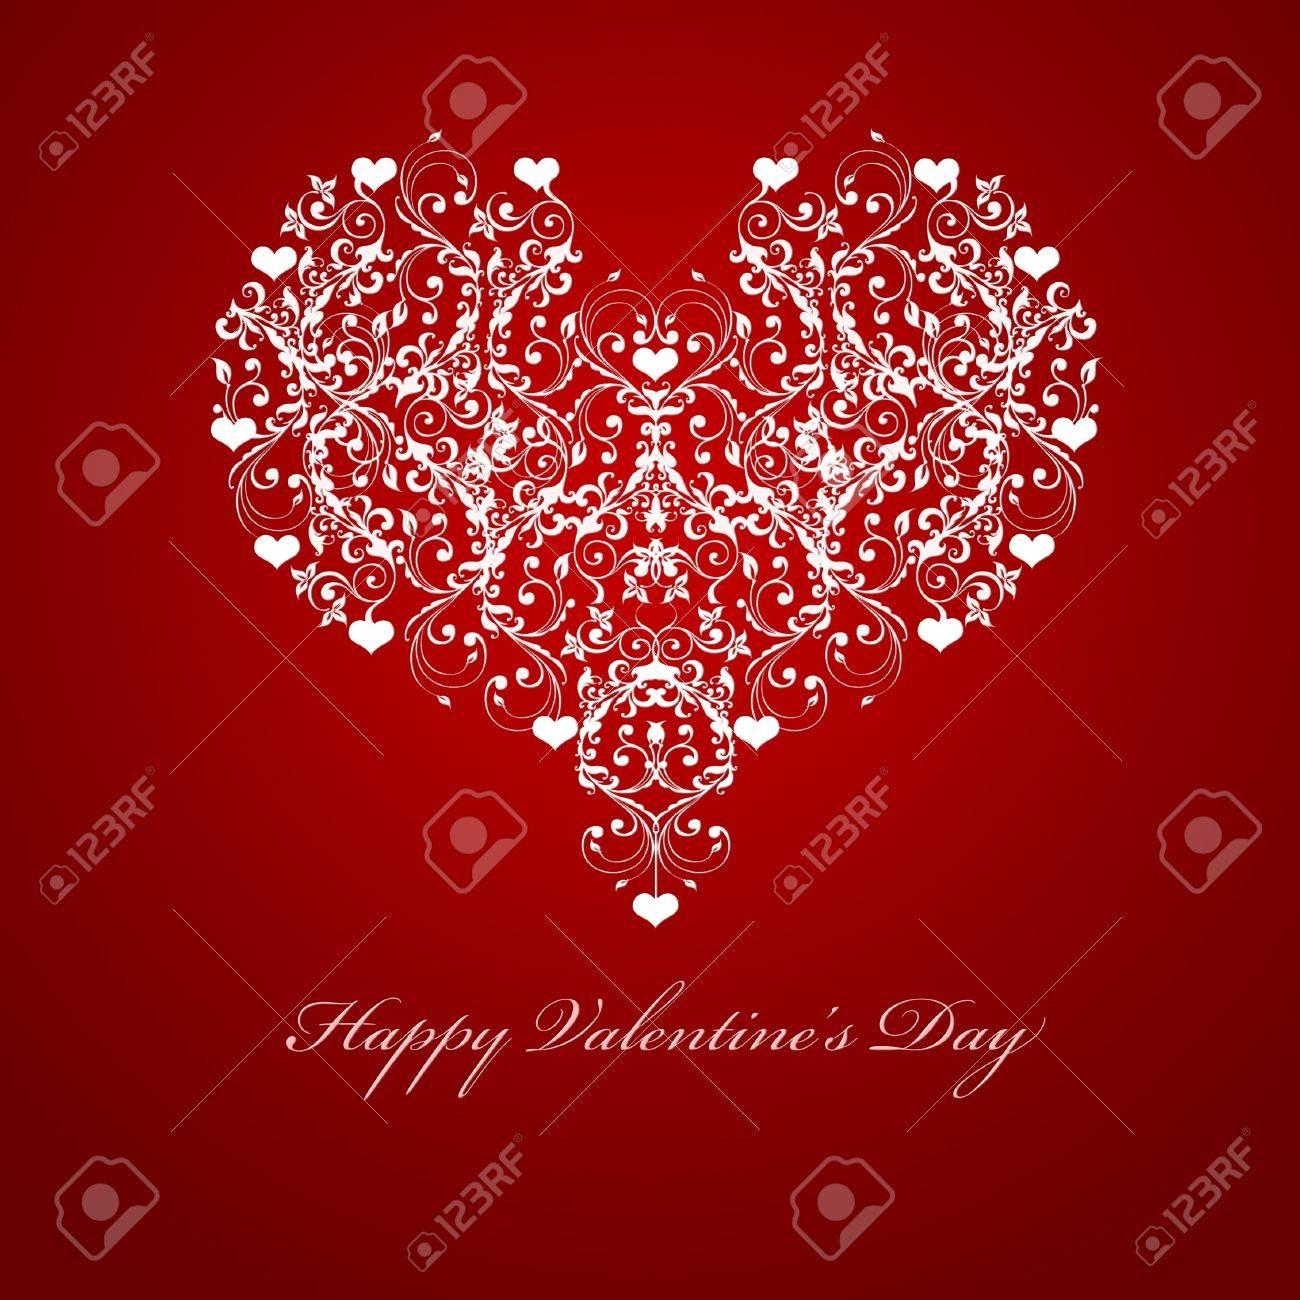 Happy Valentines Day Embossed Leaf Vine Hearts Motif Illustration Red Stock Illustration - 8379538